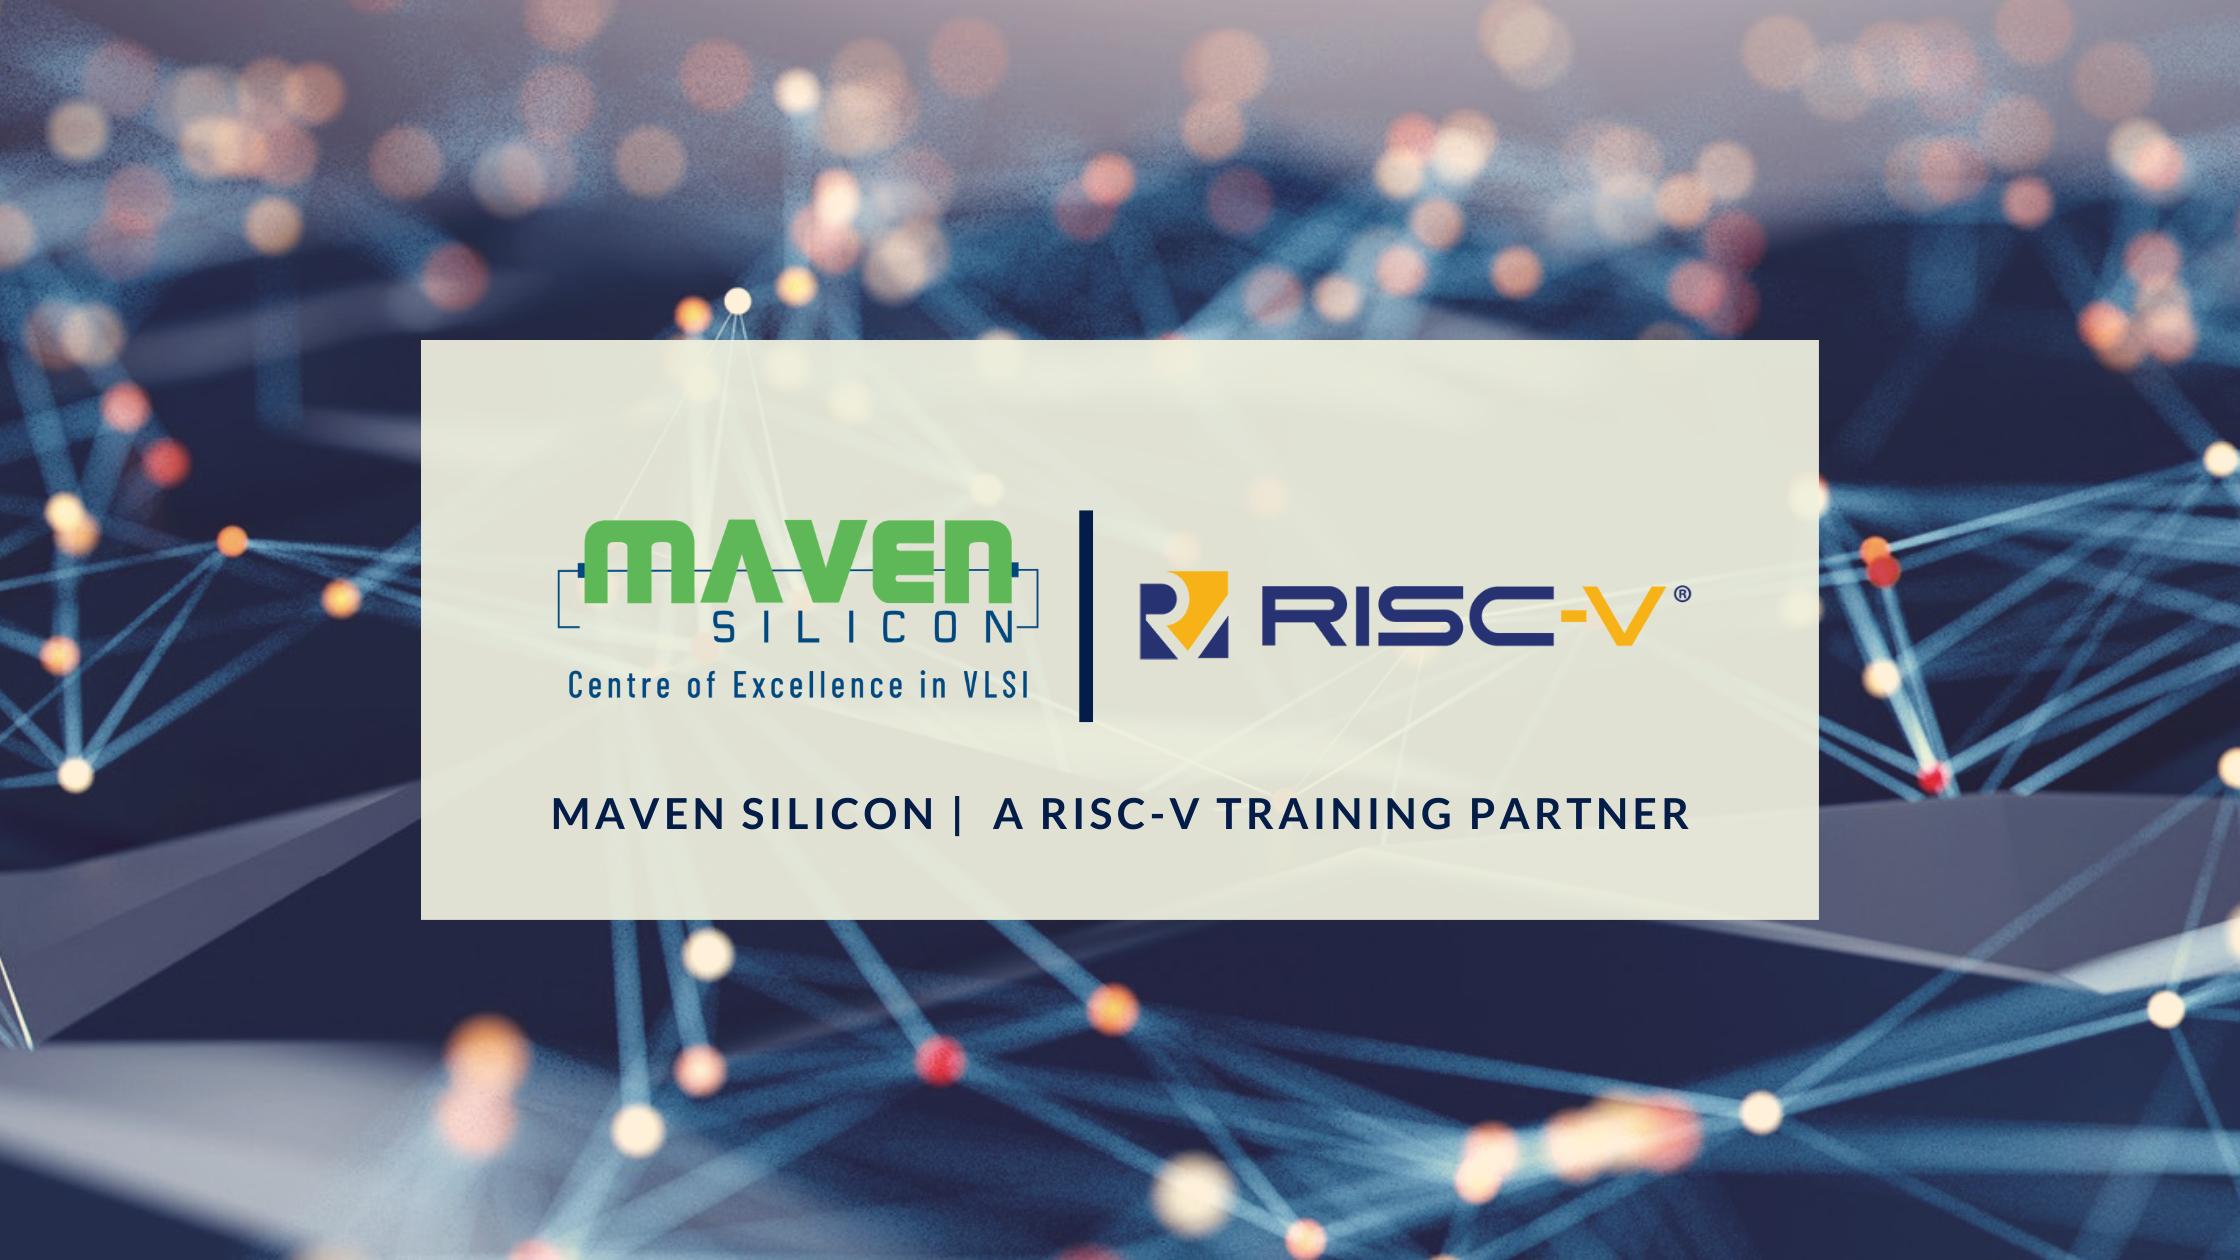 Video: RISC-V Application to Machine Language | Maven Silicon